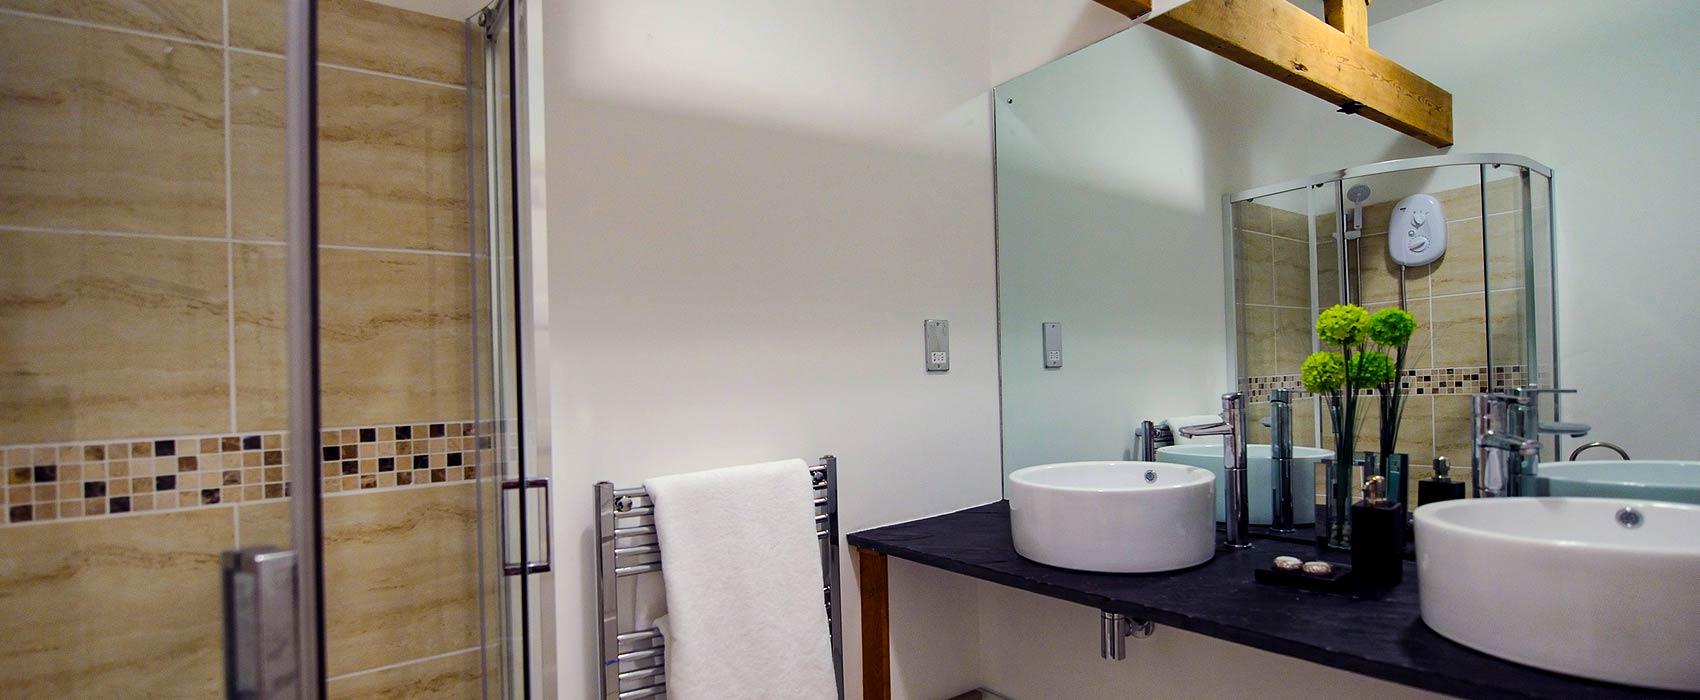 The Dartmoor Bathroom